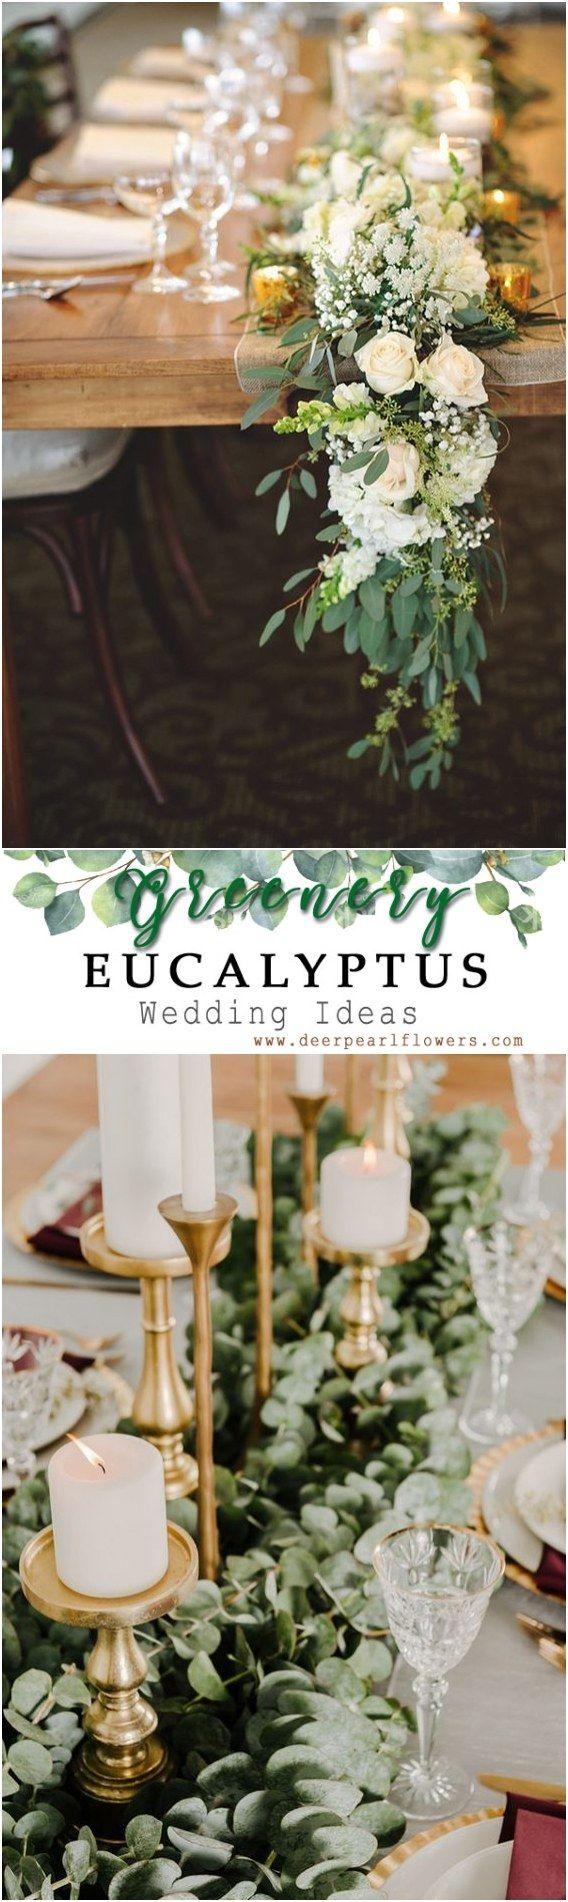 Decor ideas for wedding   Greenery Eucalyptus Wedding Decor Ideas  Rustic Wedding Ideas